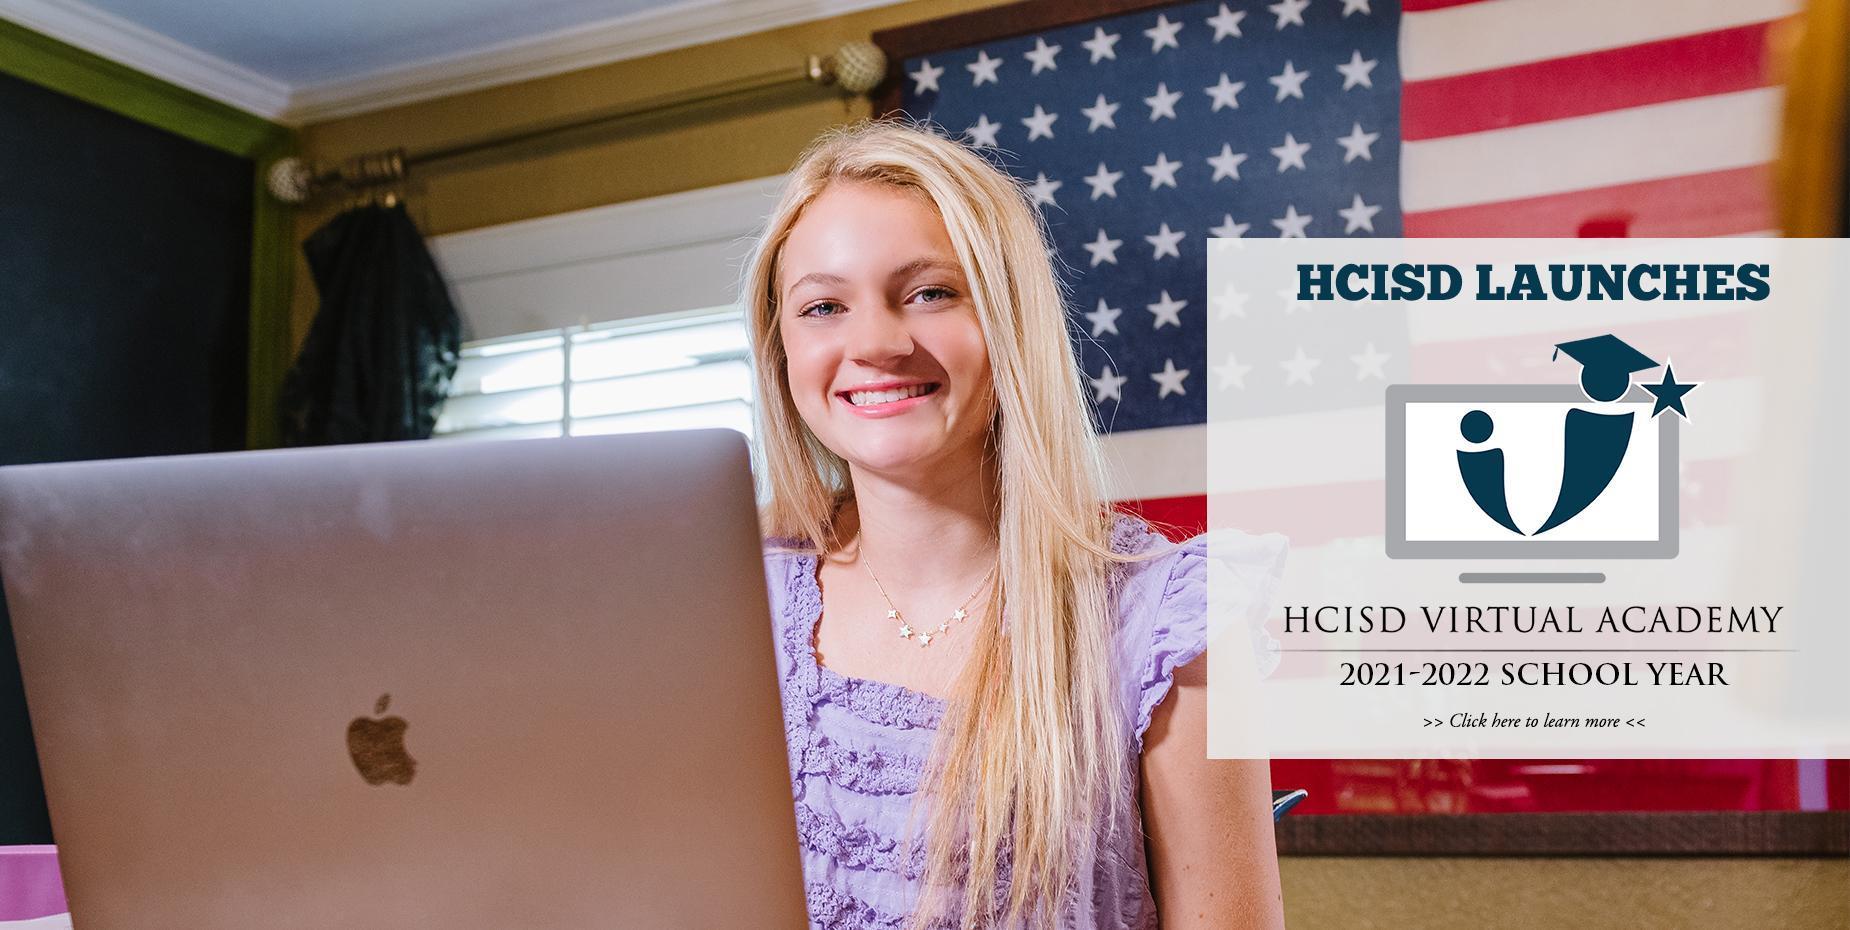 HCISD Launches HCISD Virtual Academy